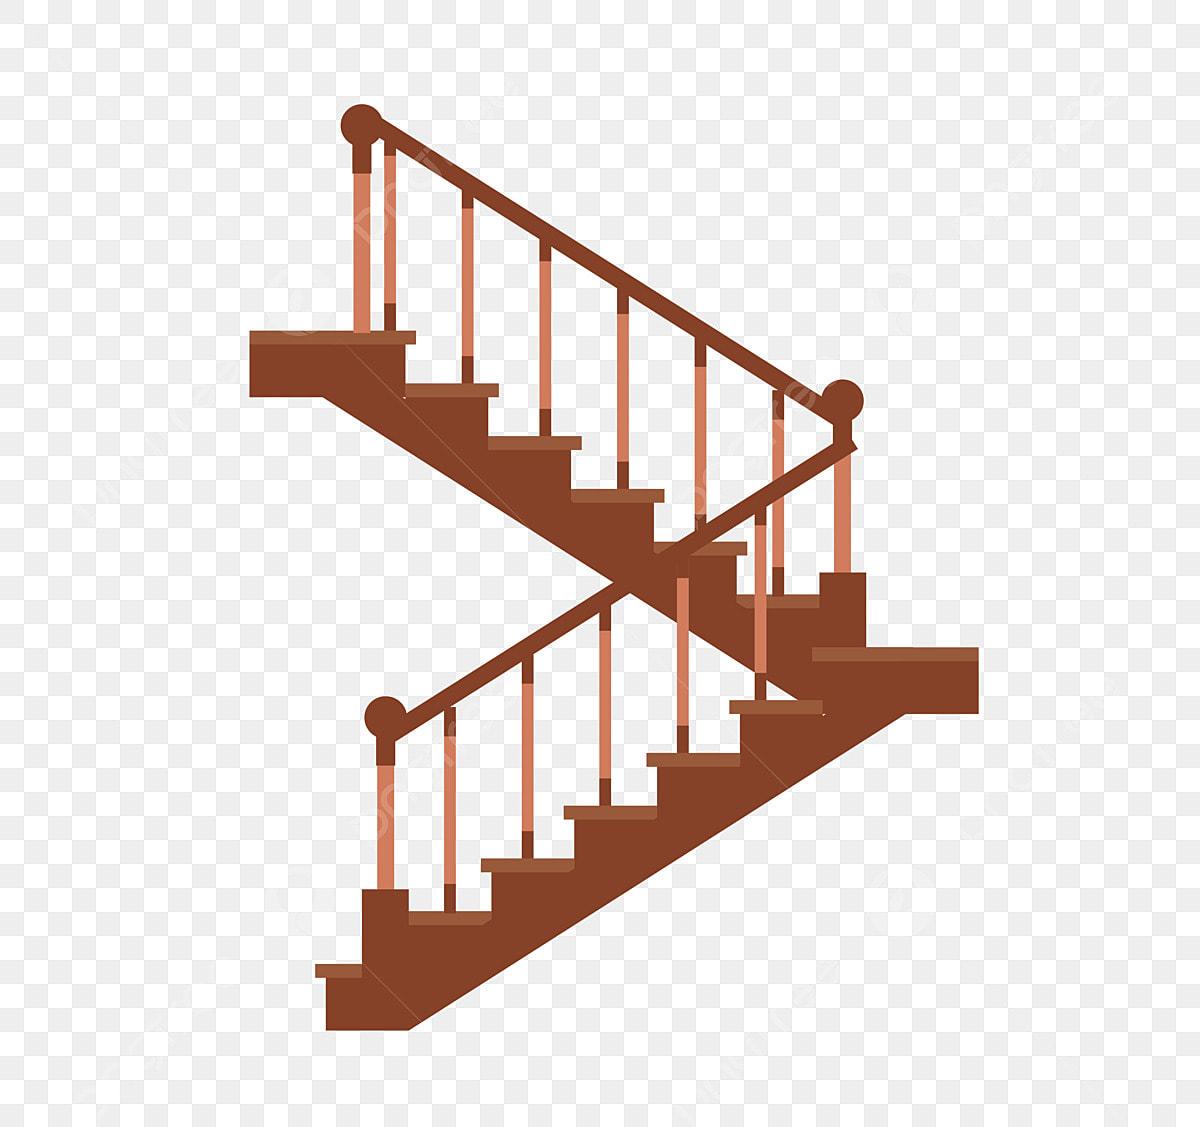 https fr pngtree com freepng brown corner staircase illustration 4712276 html